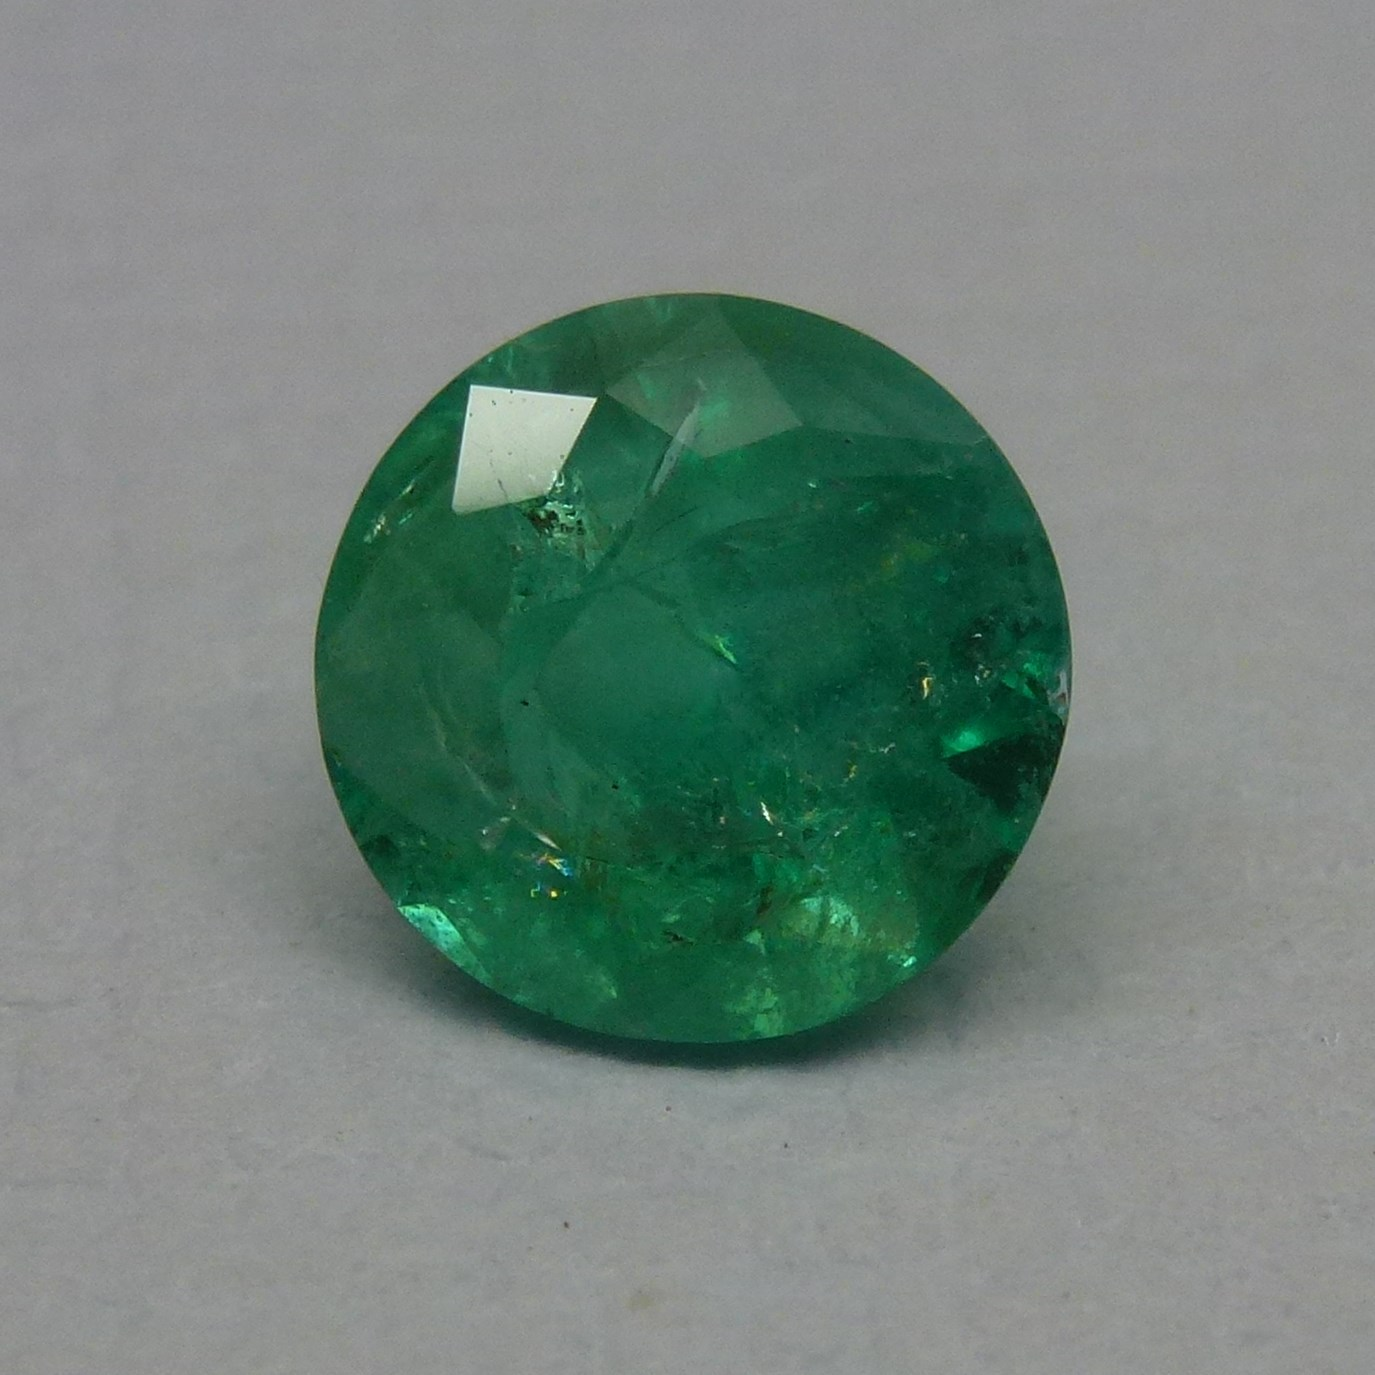 15066 - Emerald